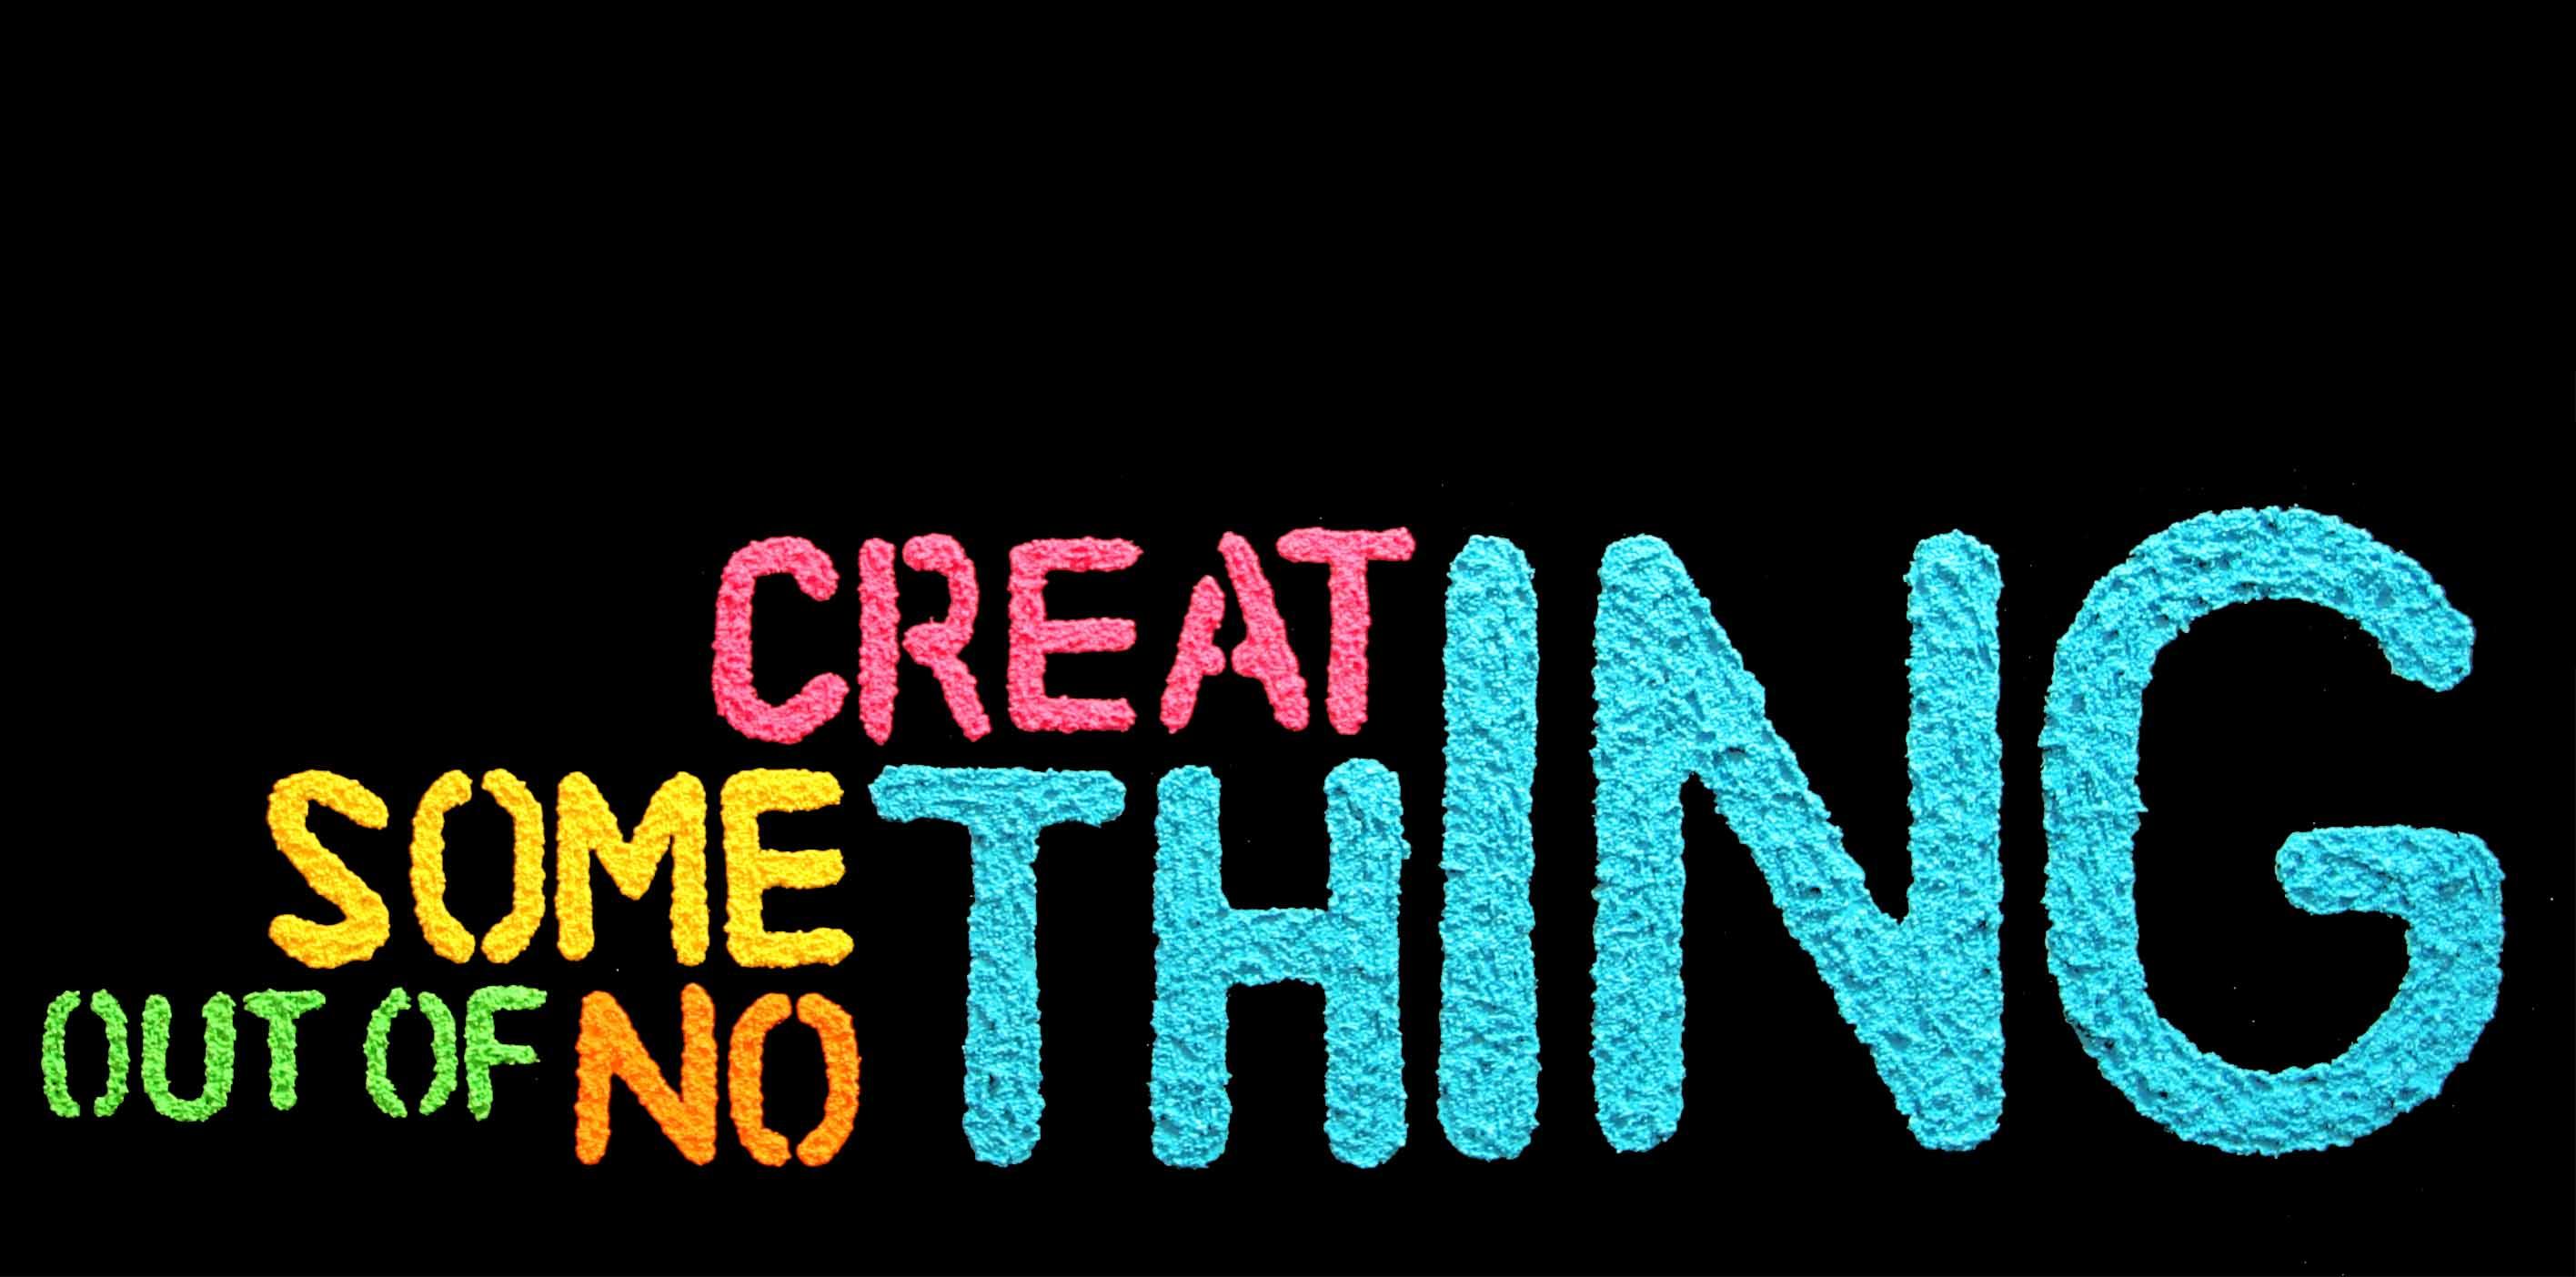 Be Creativ!